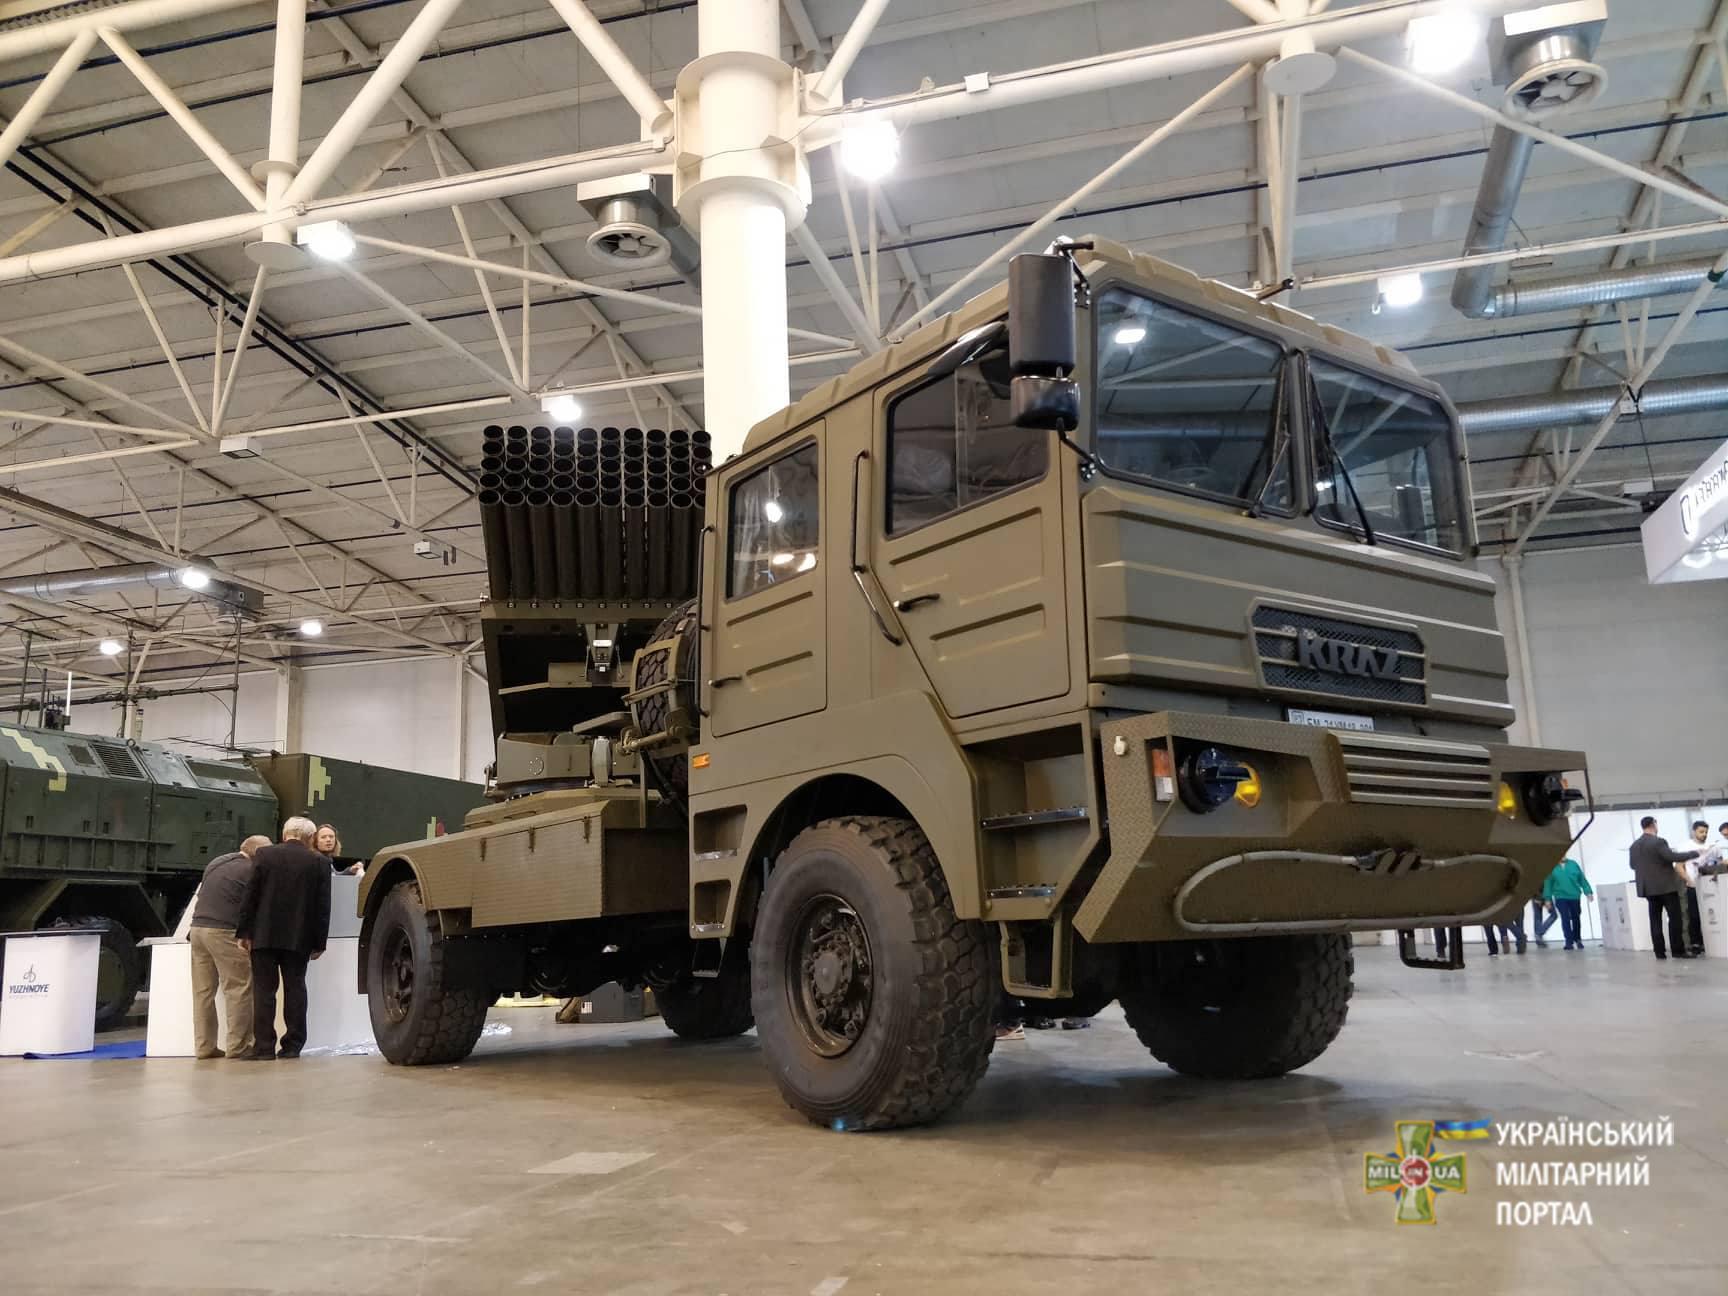 122-мм РСЗВ БМ-21У Шепетівського ремонтного заводу